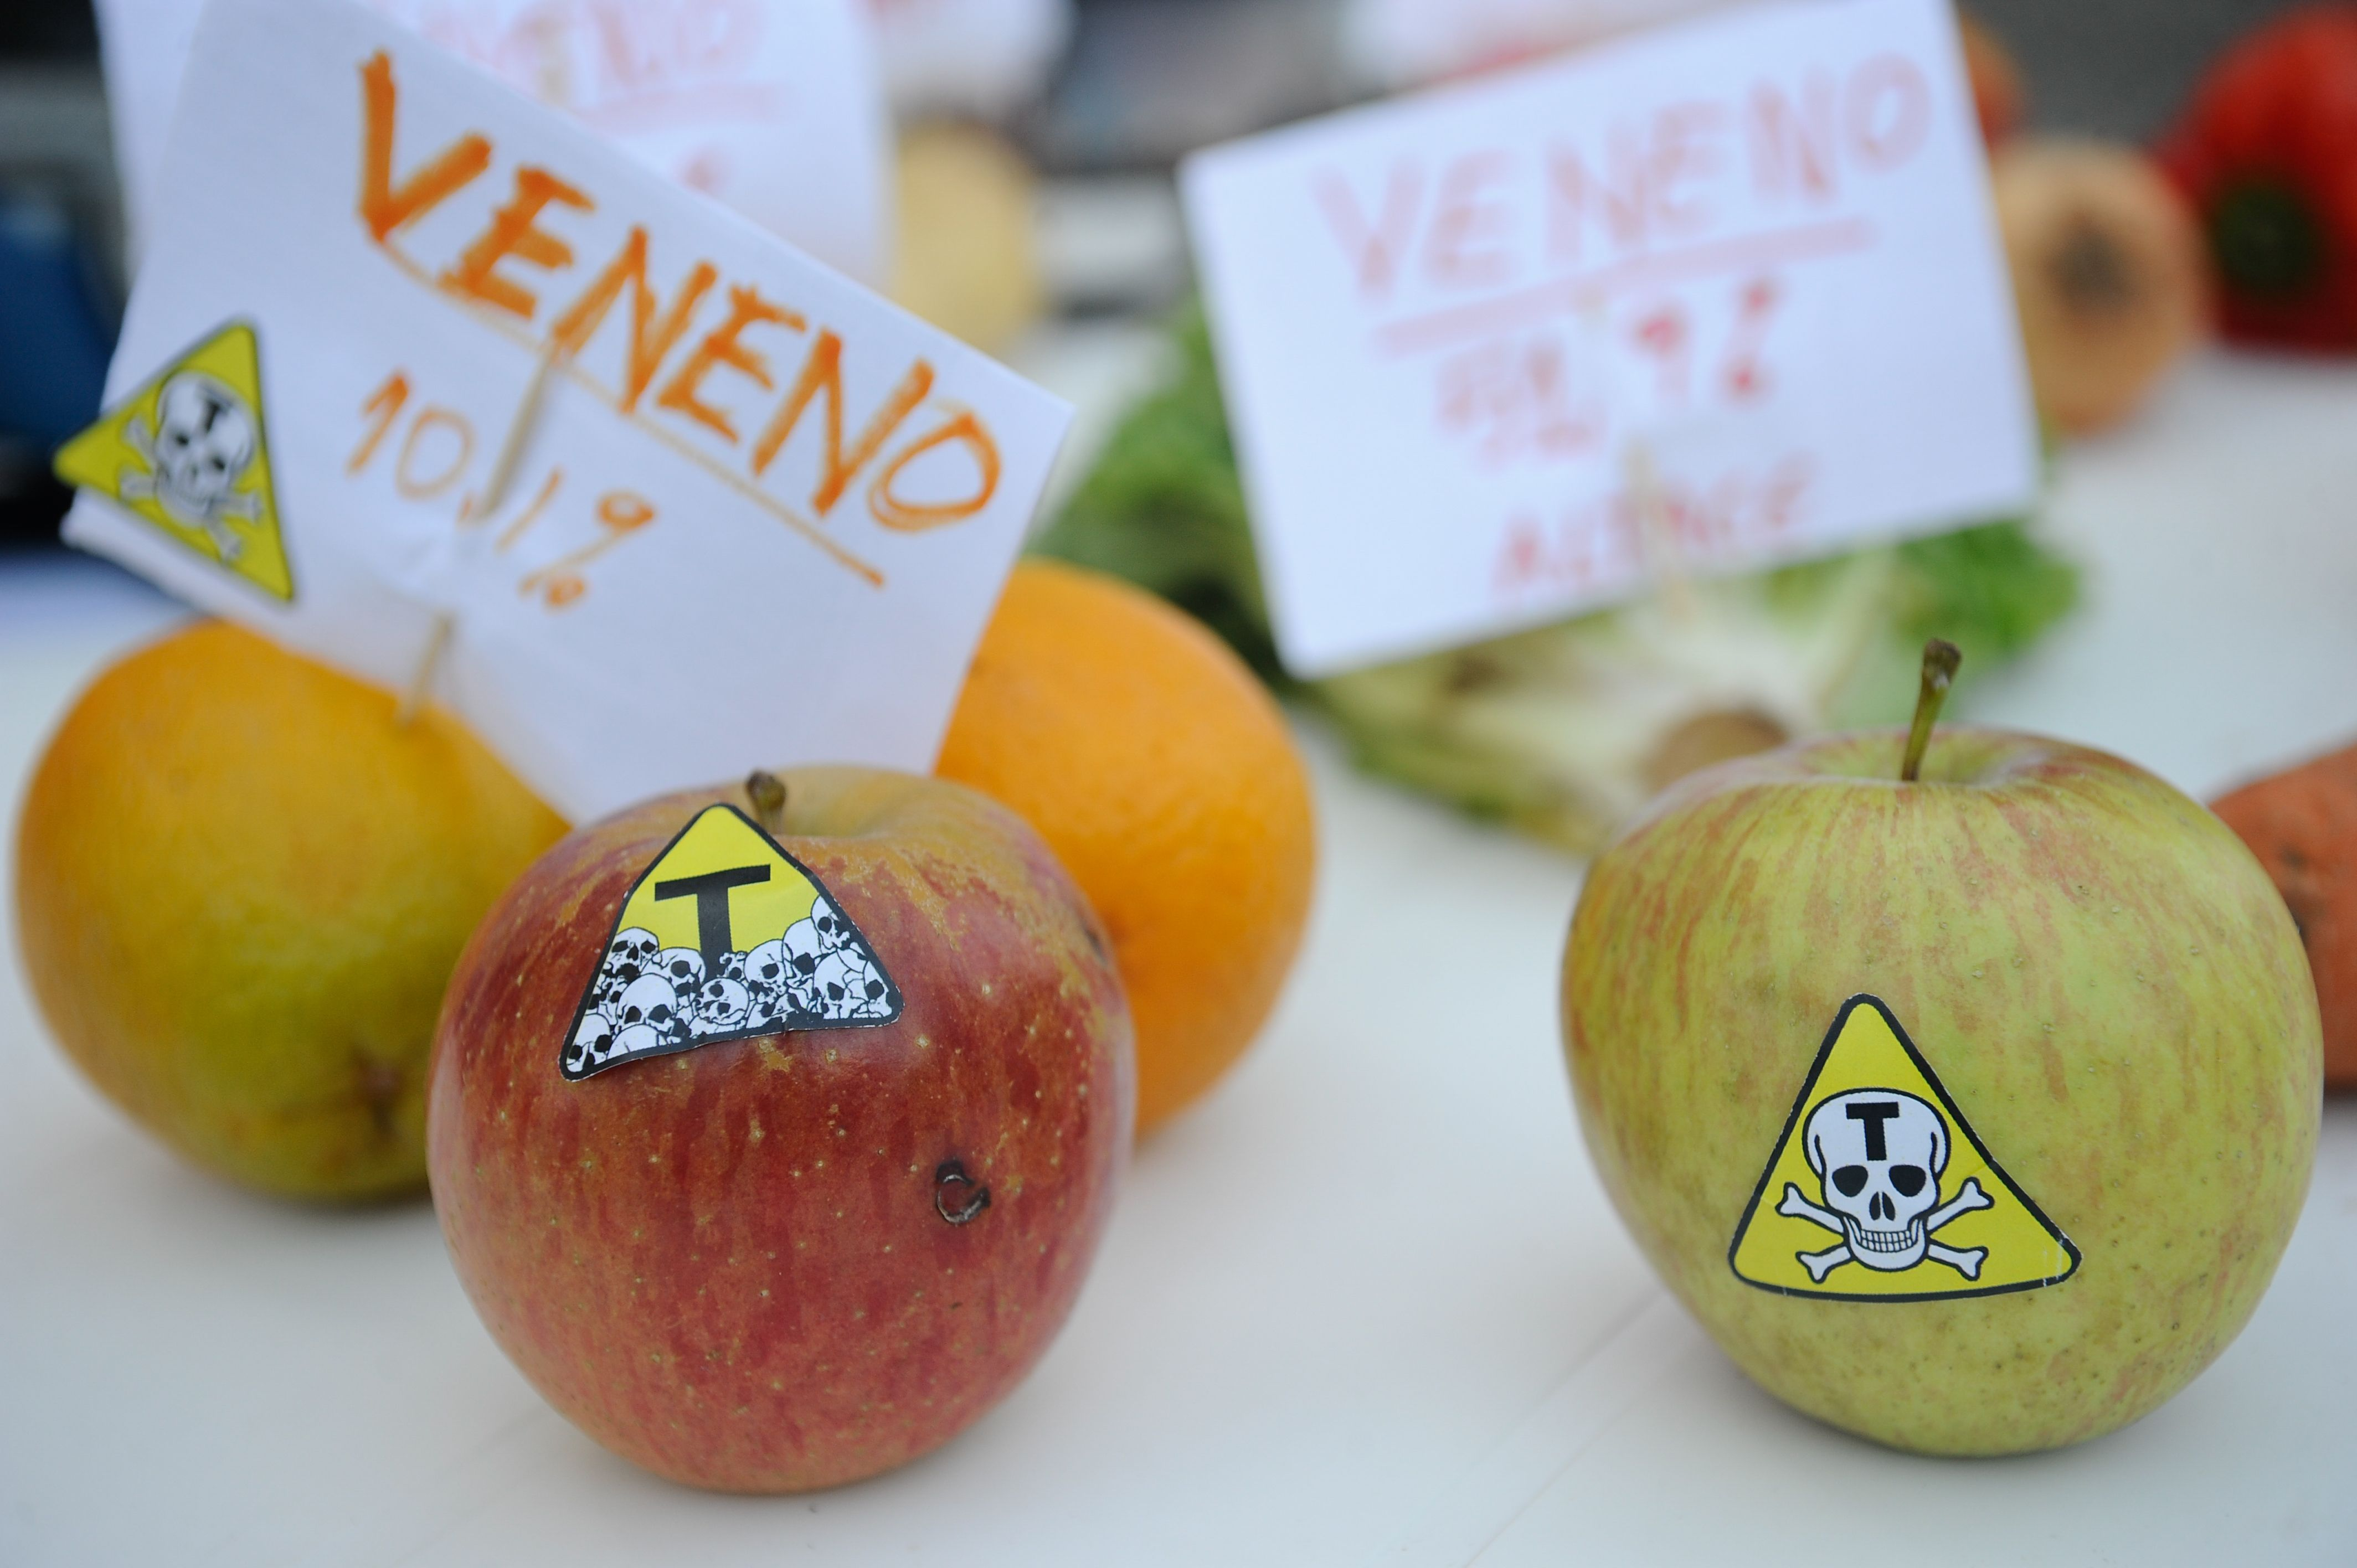 11-12-14_foto_fernando_frazao_campanha_contra_agrotoxicos (1)